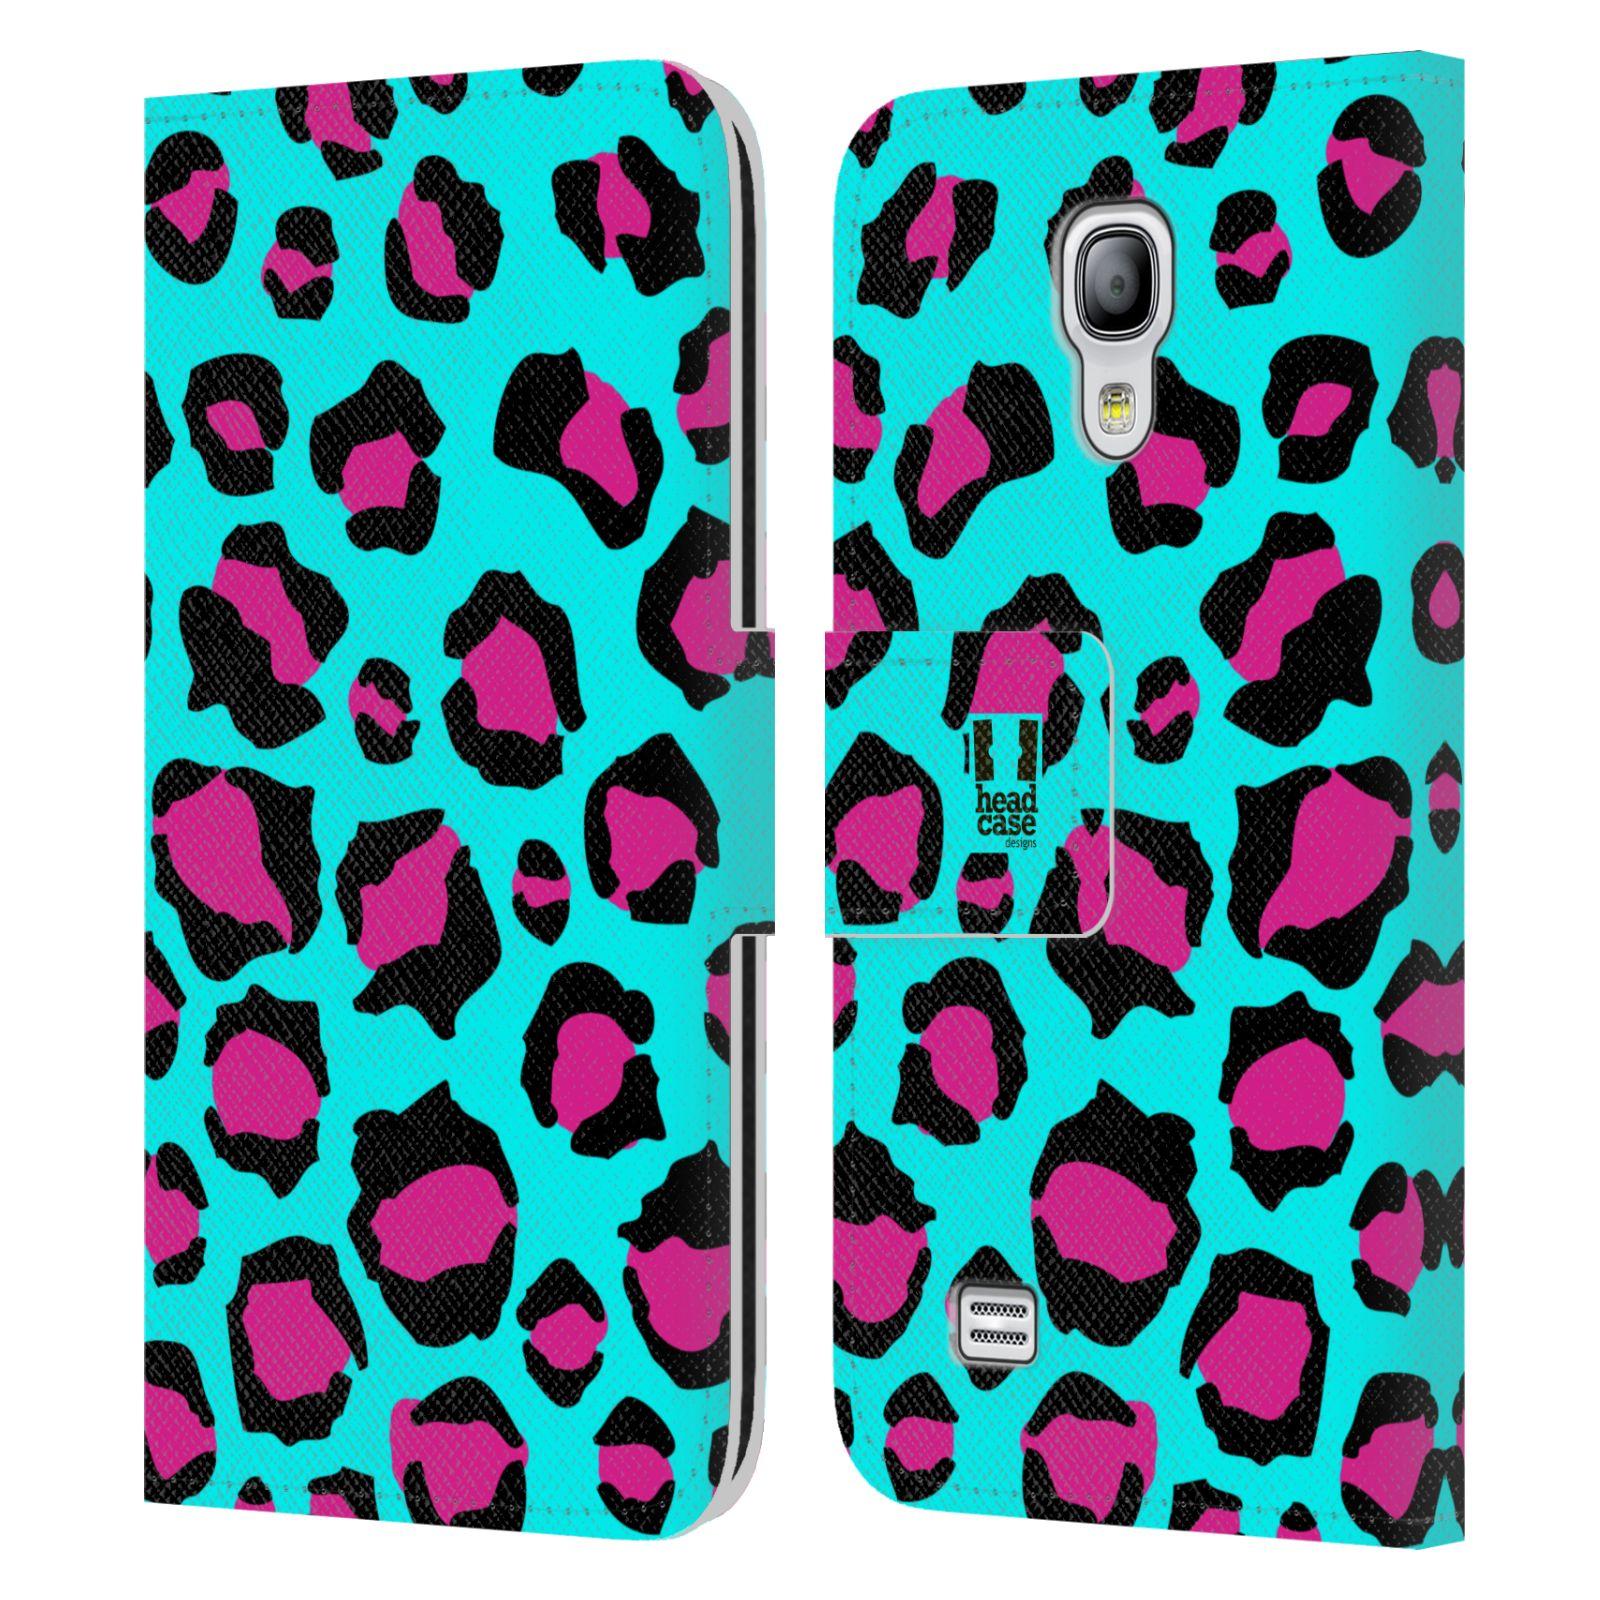 HEAD CASE Flipové pouzdro pro mobil Samsung Galaxy S4 MINI / S4 MINI DUOS Zvířecí barevné vzory tyrkysový leopard